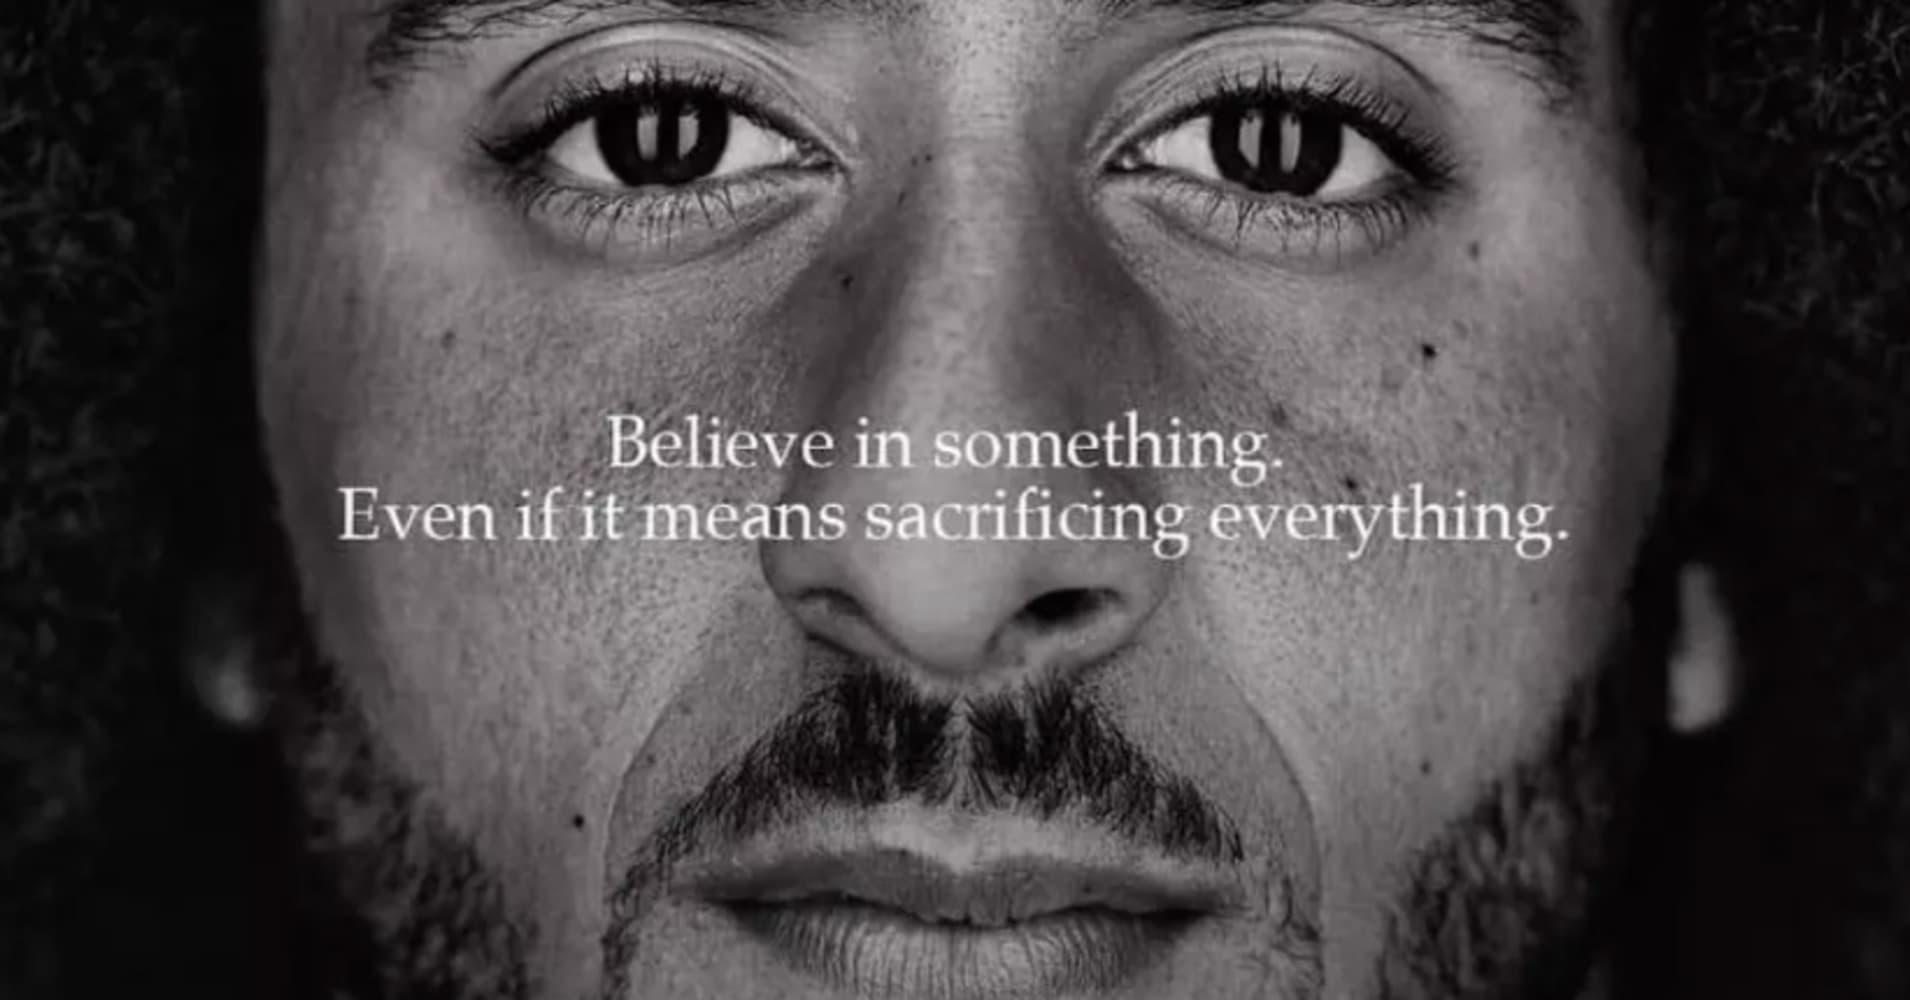 Nike's Kaepernick ad draws record likes on social media, boosts sales